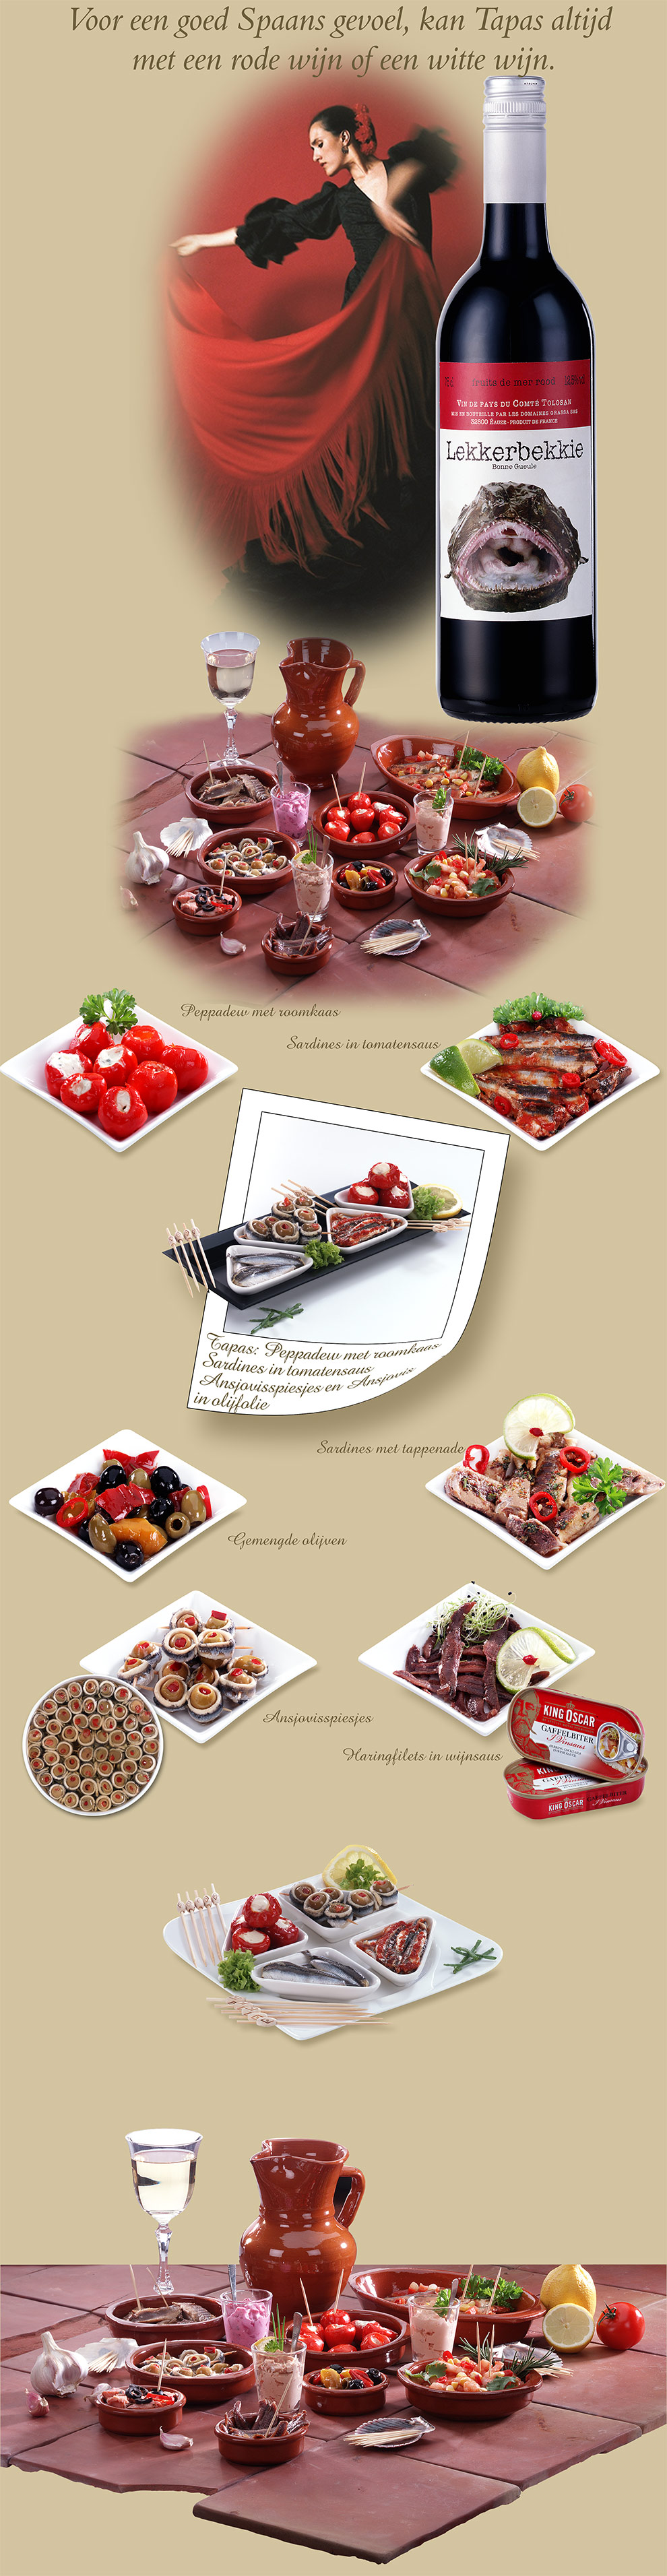 delicatessen-tapas